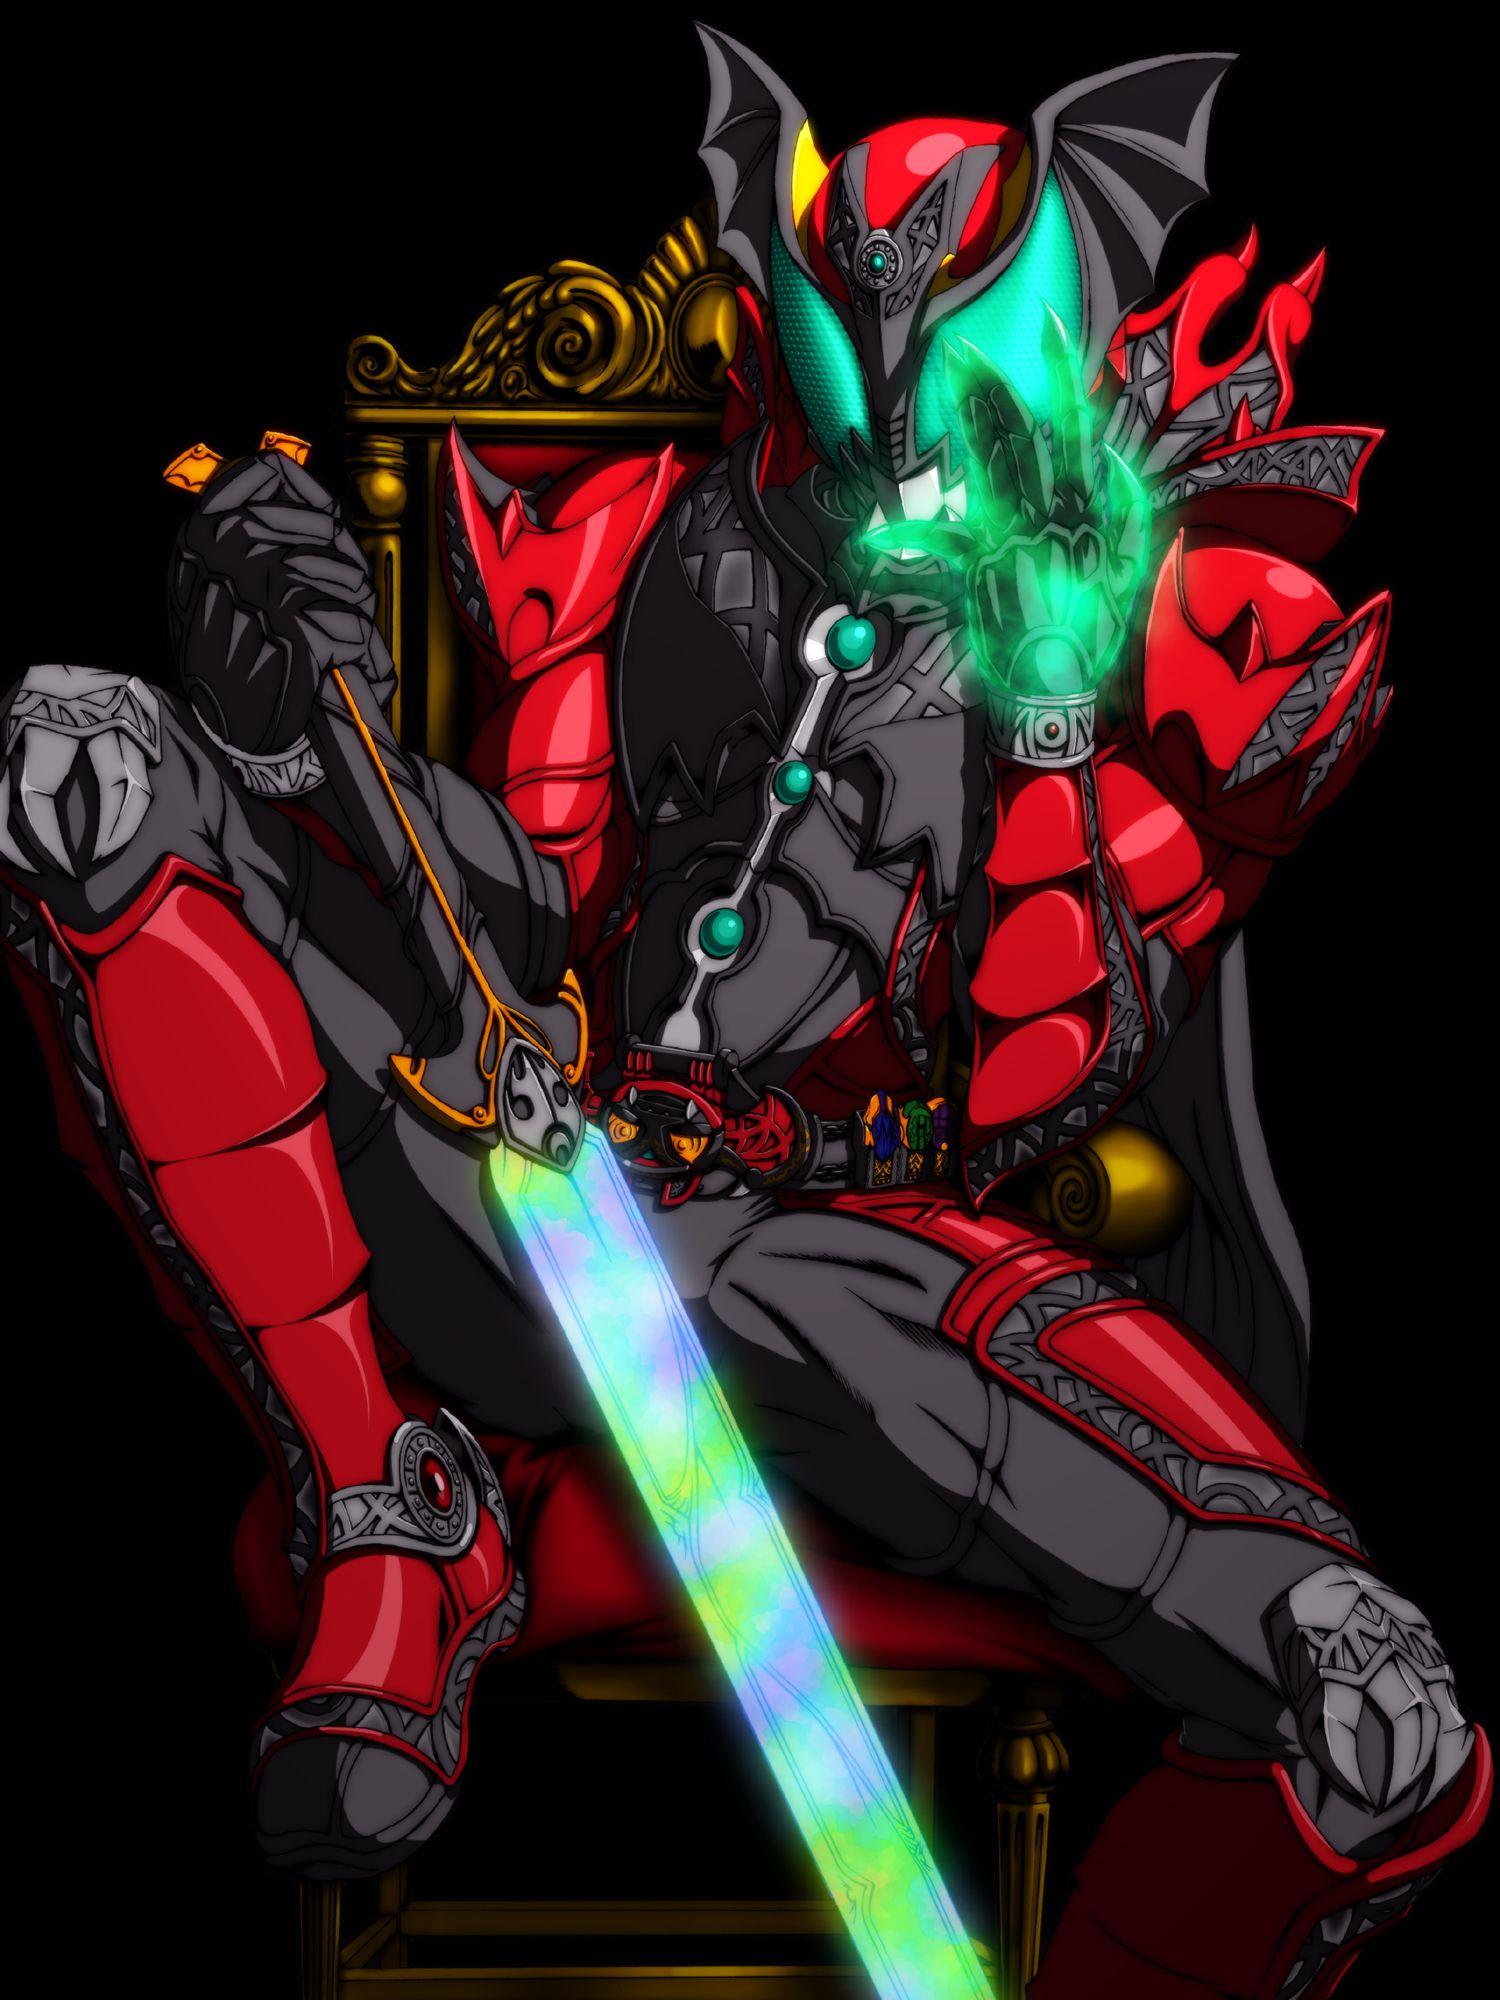 Kamen Rider V3 Character 1198497 Zerochan Anime - Year of